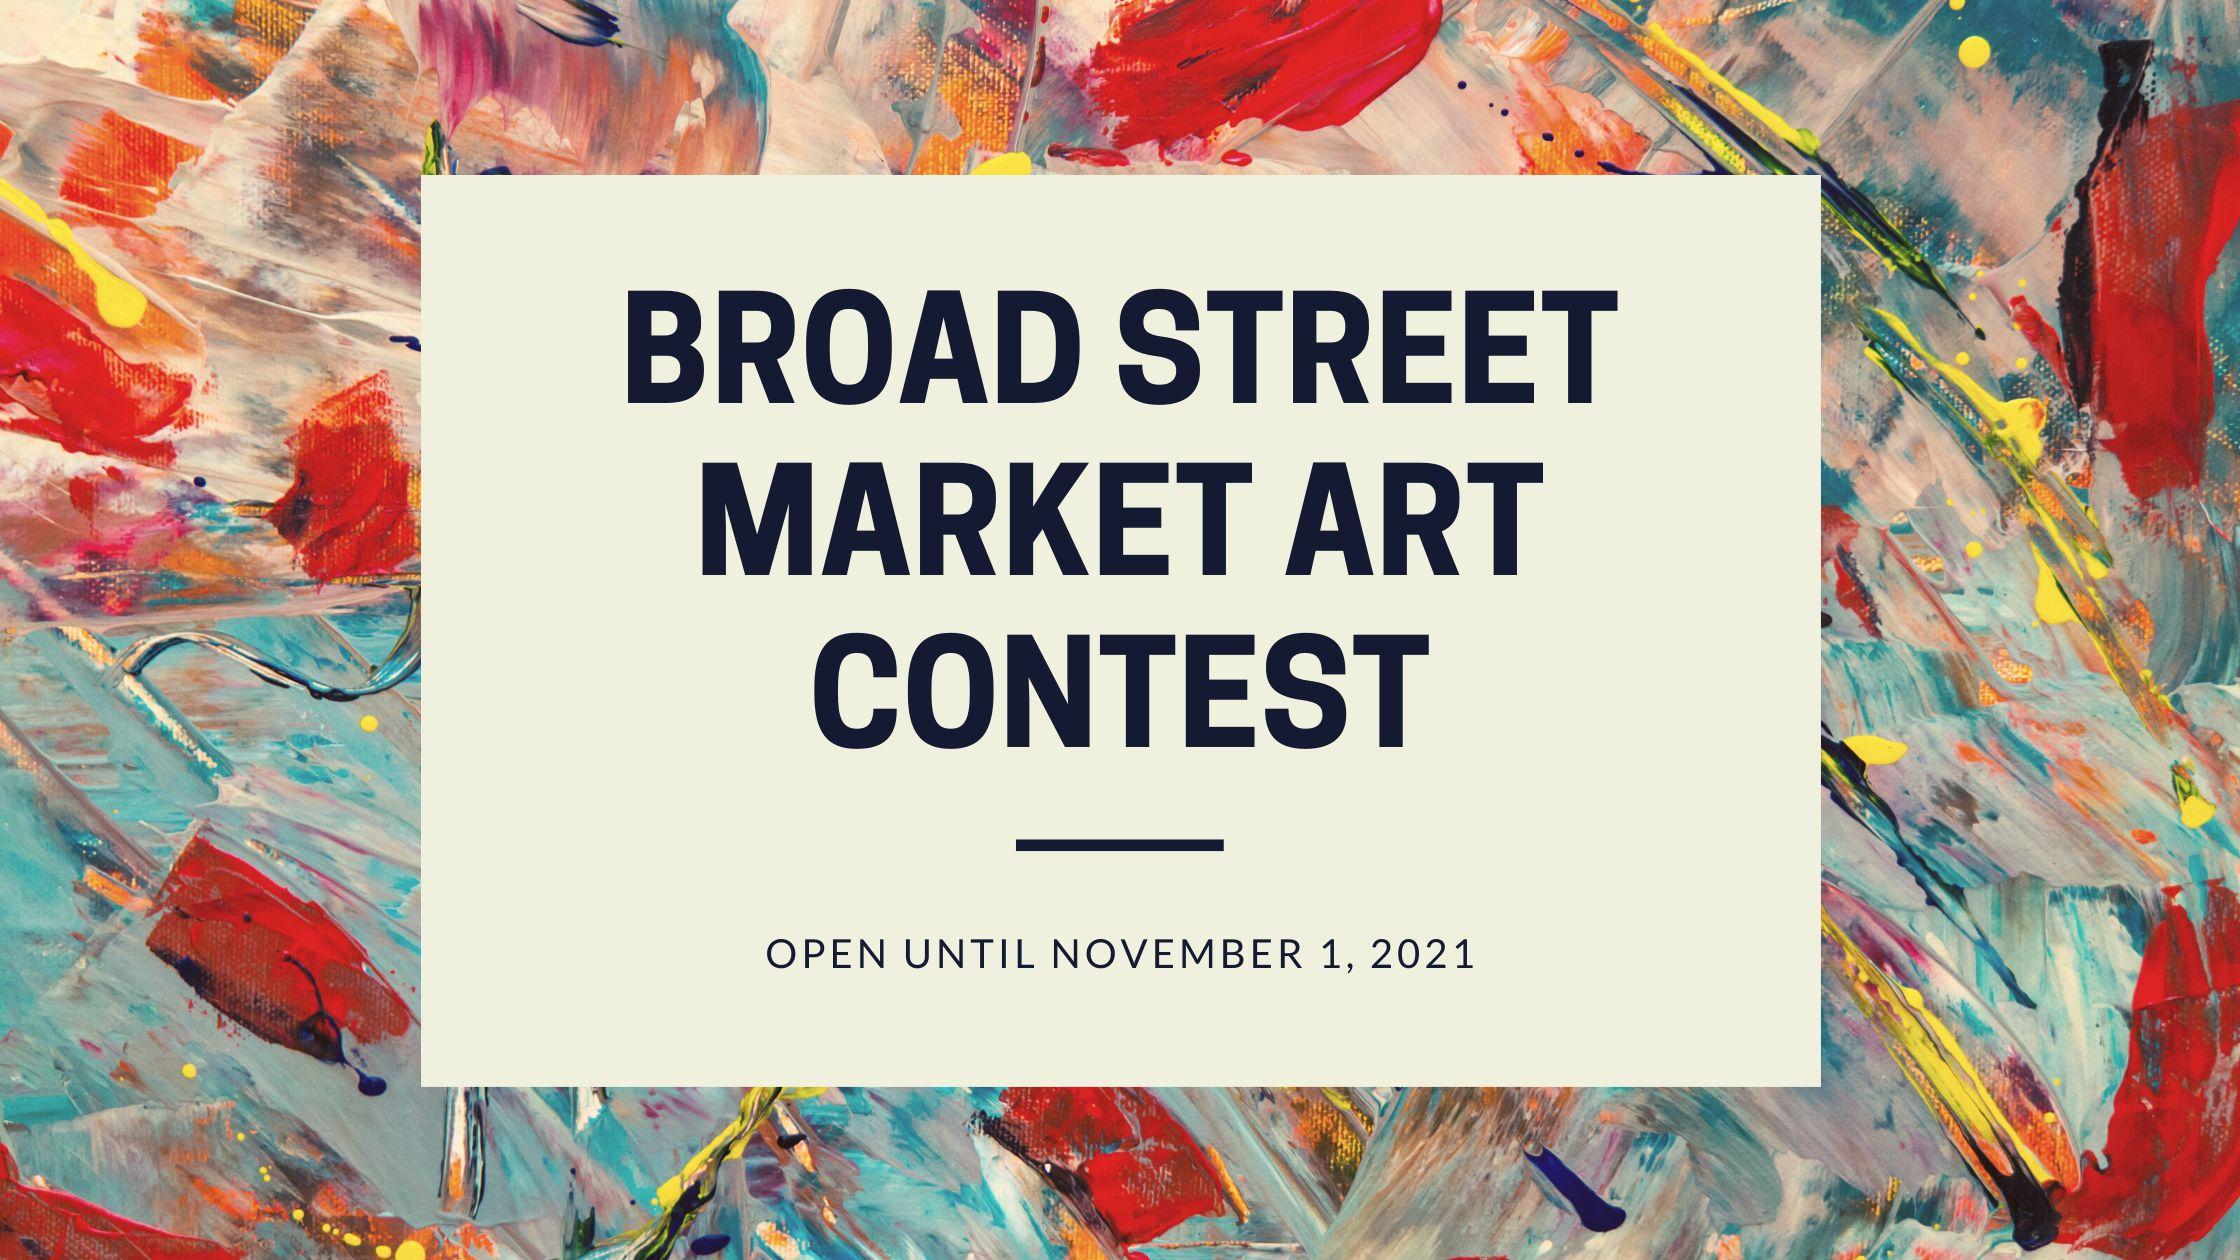 Broad Street Market Art Contest